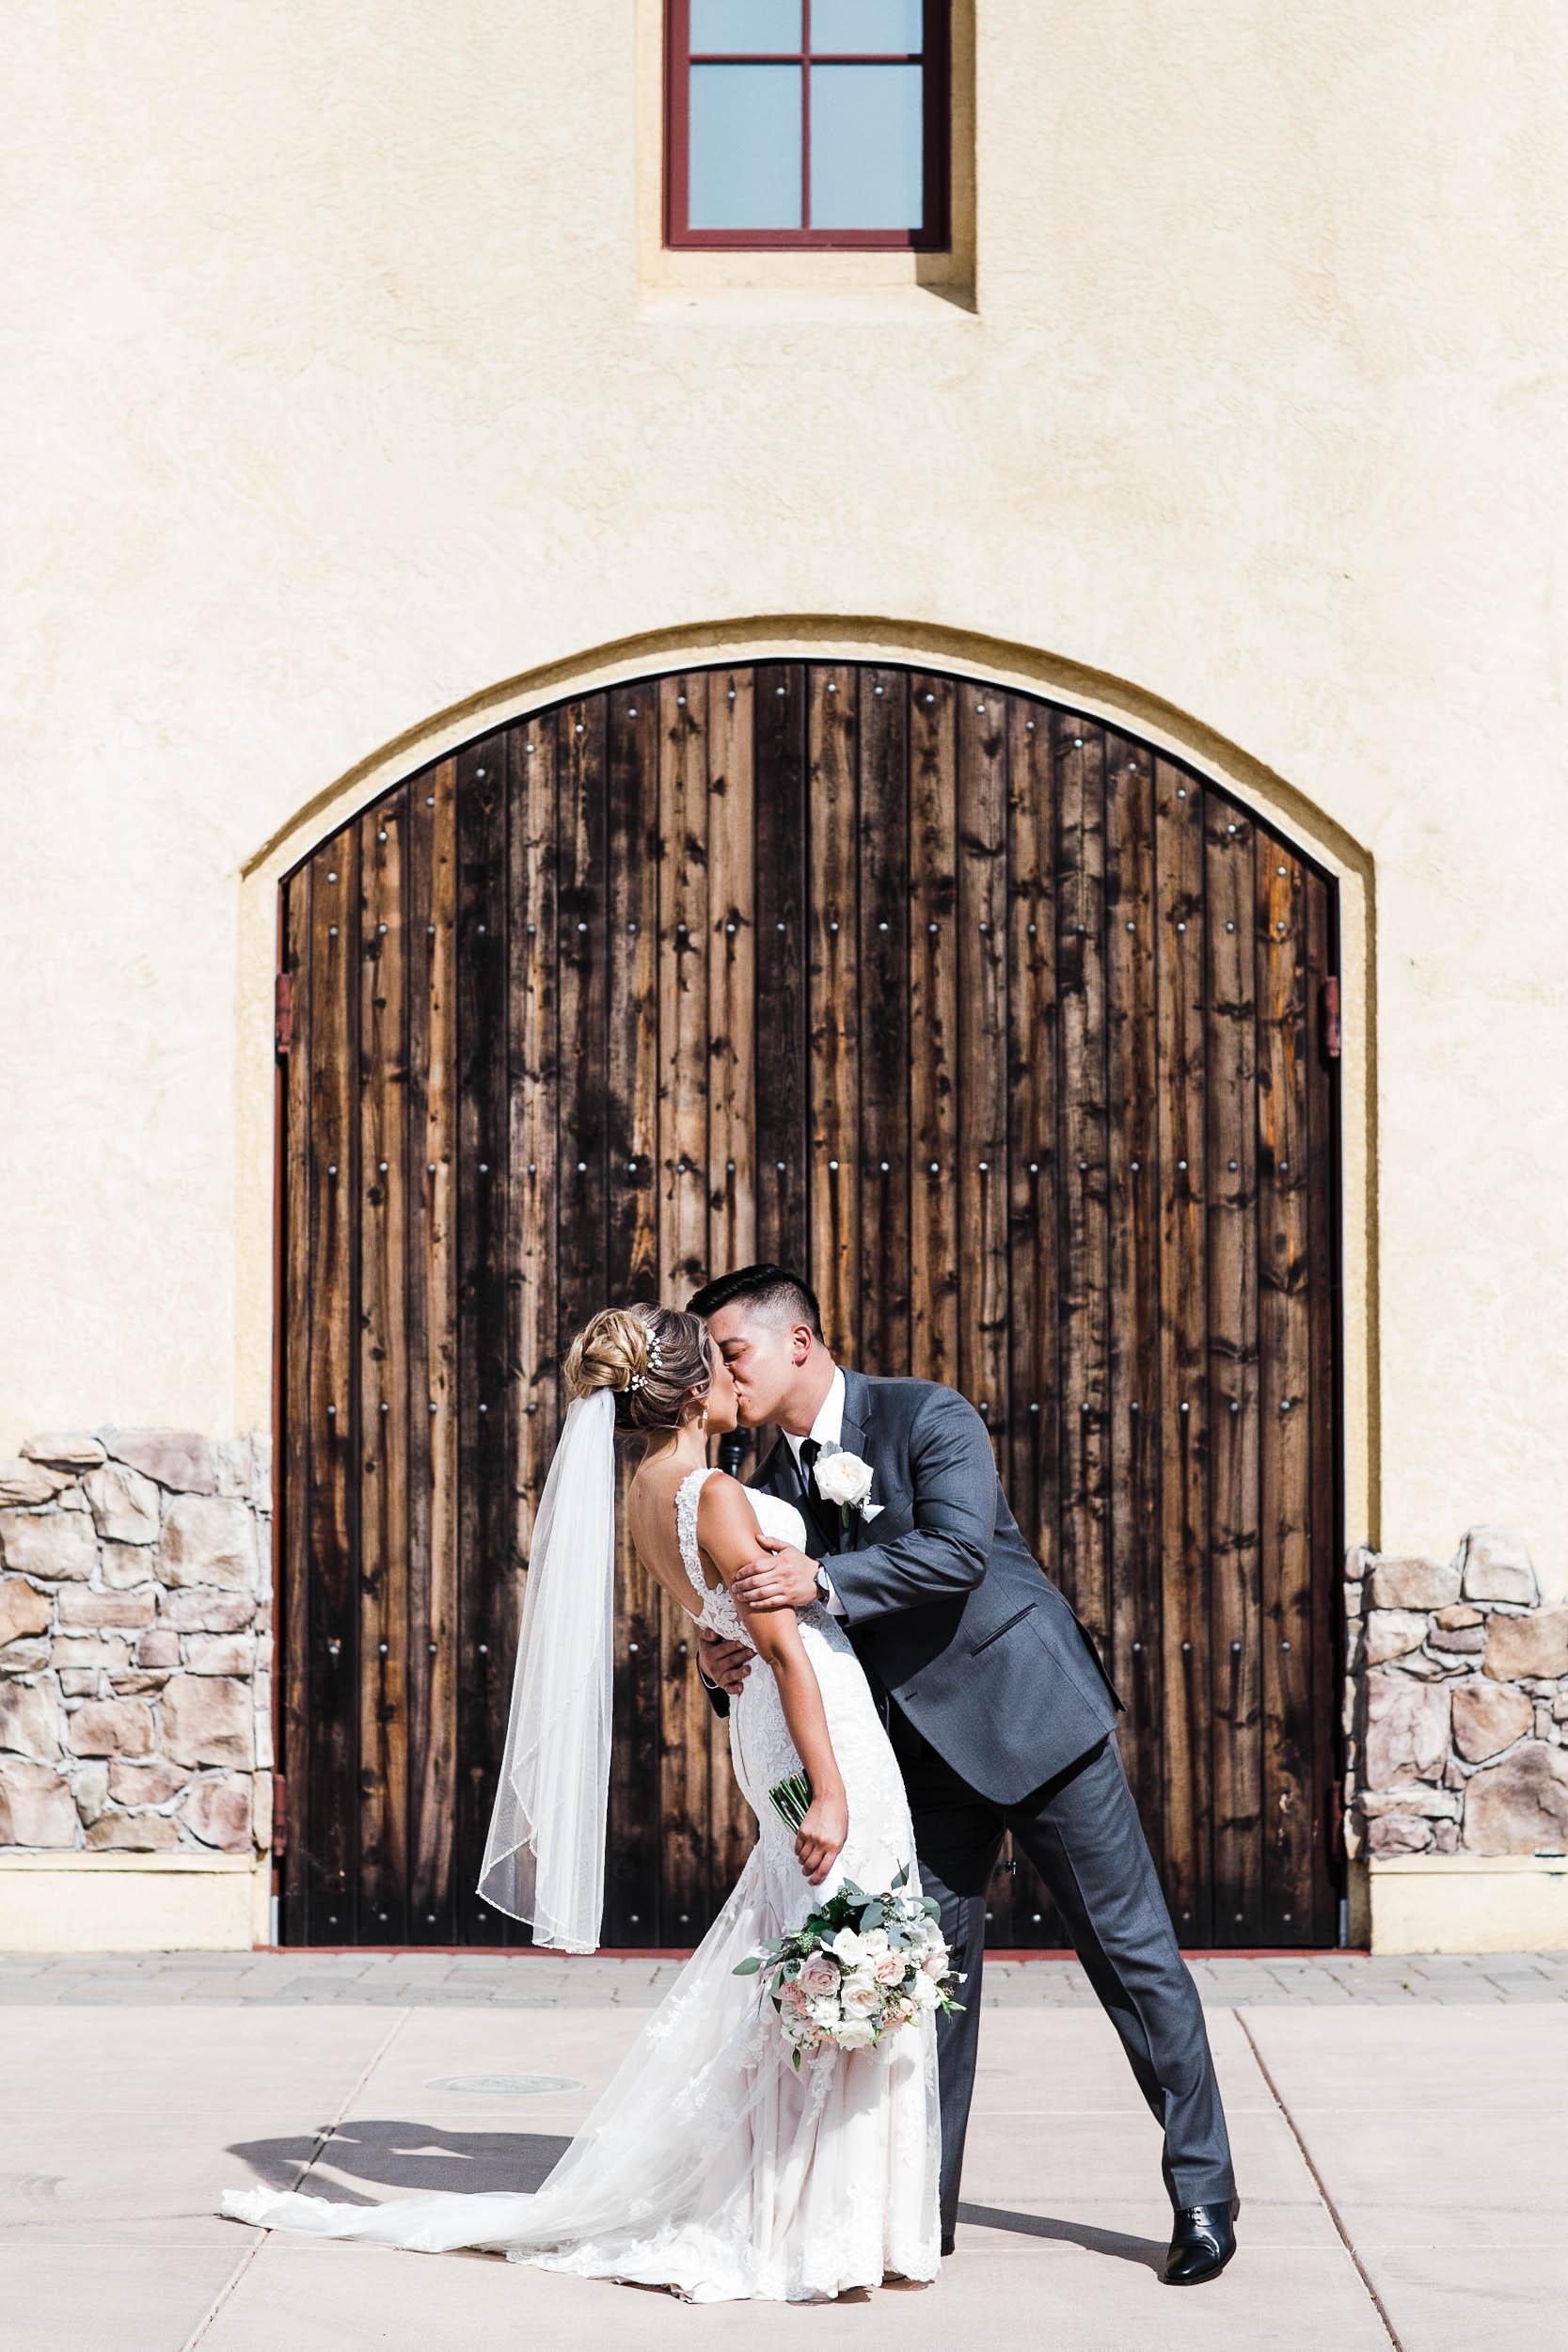 Las Positas Wedding_Buena Lane Photography_090118ER242.jpg